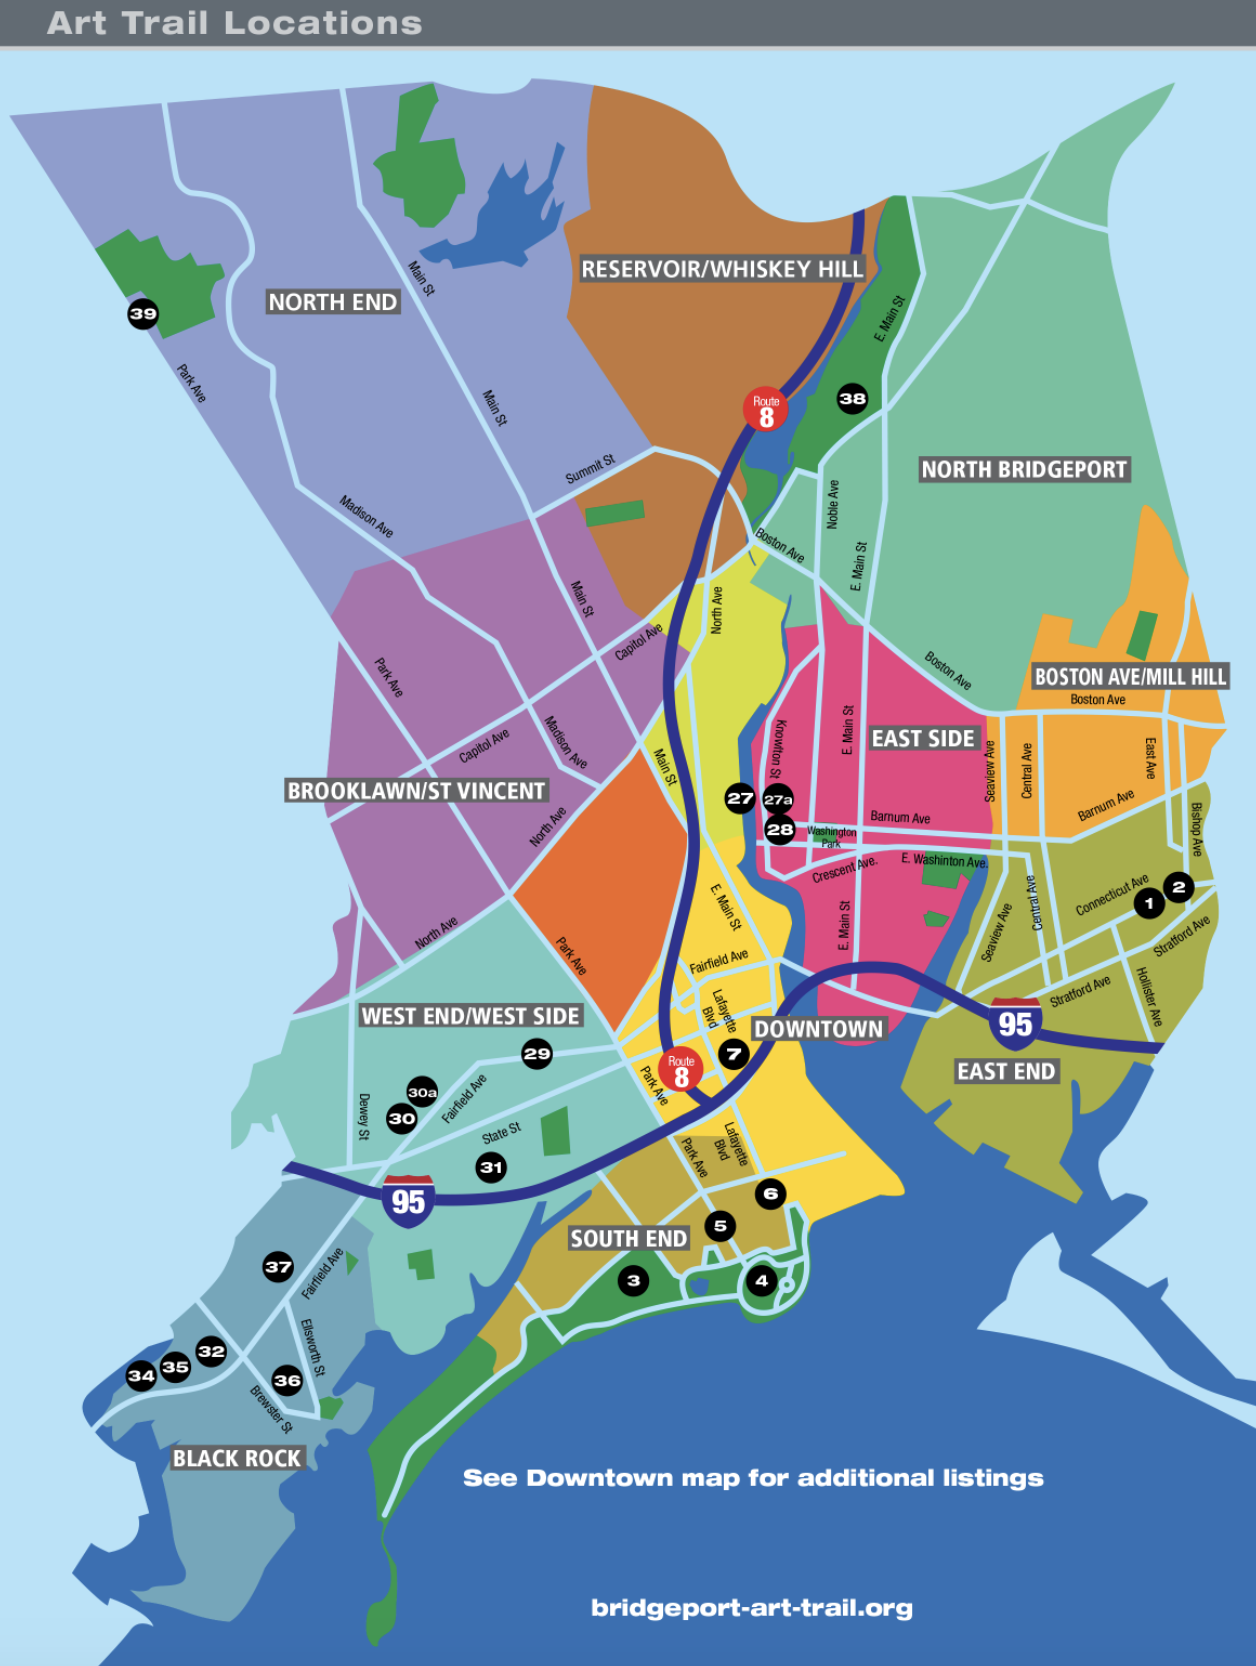 Bridgeport Art Trail Interactive Map